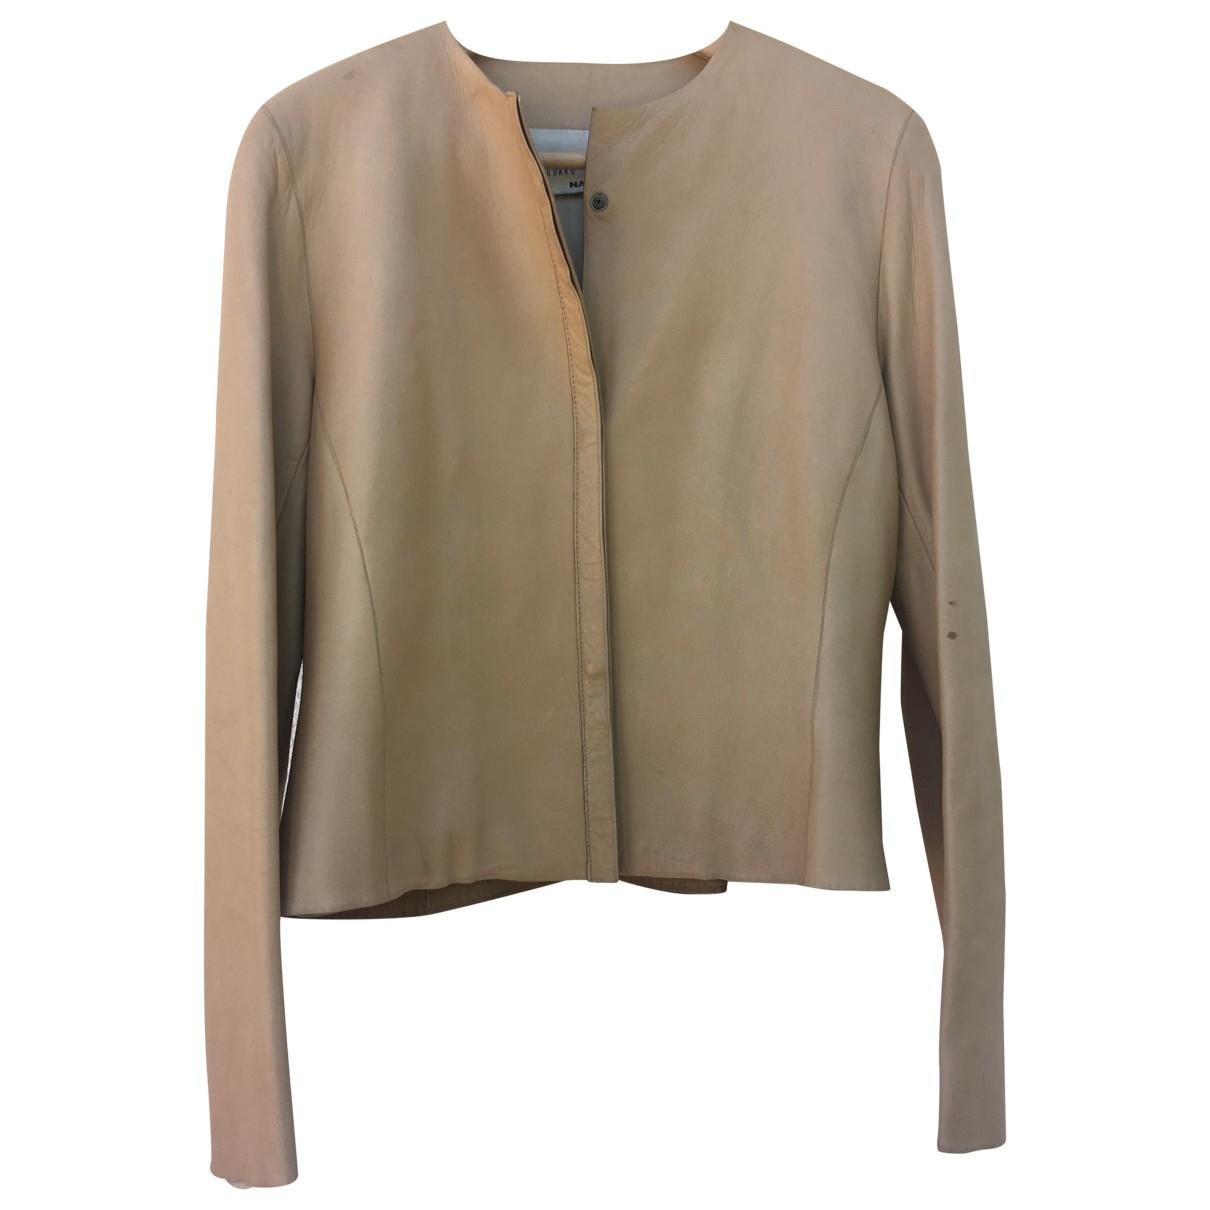 Natan \N Beige Leather jacket for Women One Size FR